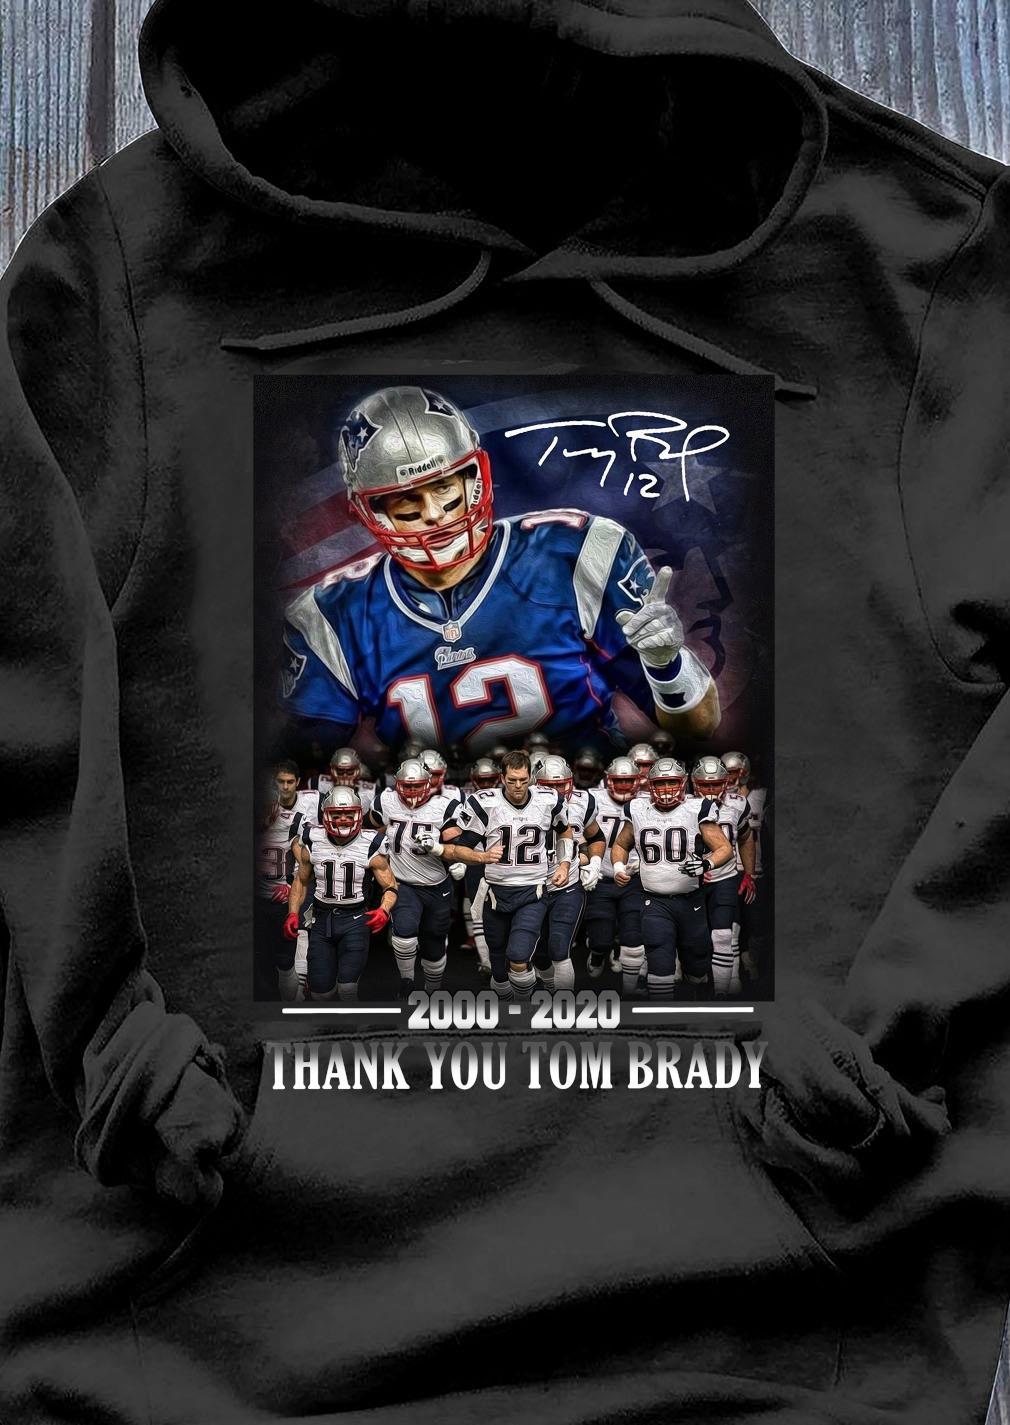 New England Patriots 2000-2020 Thank You Tom Brady Shirt Hoodie